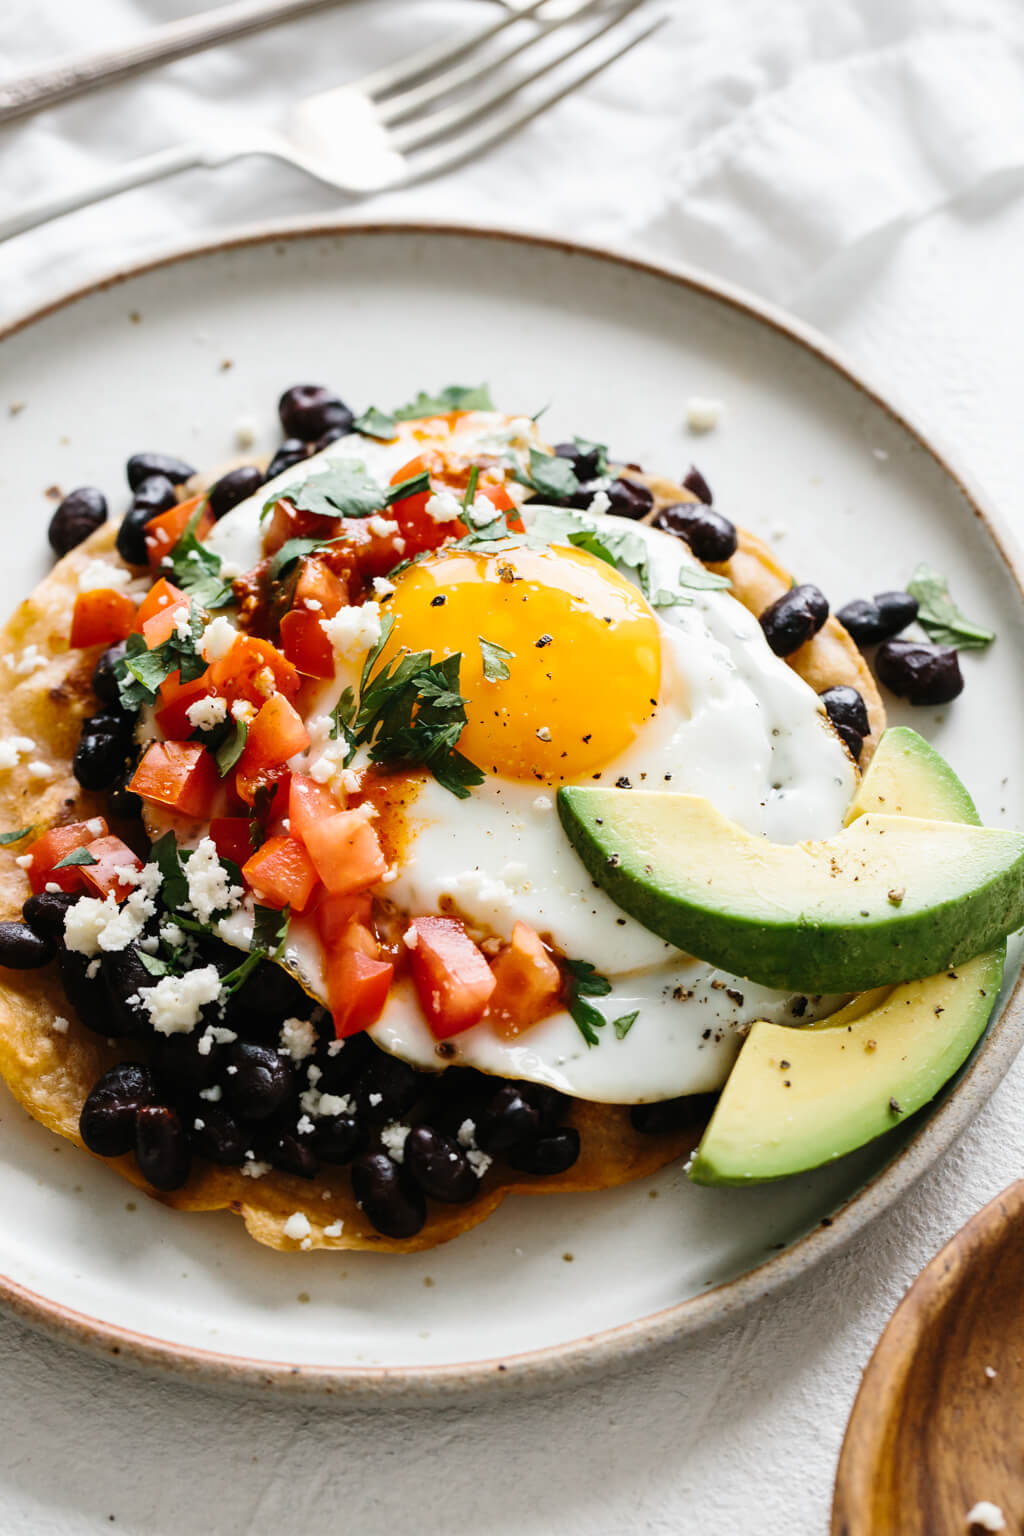 Huevos rancheros on a white plate next to forks.